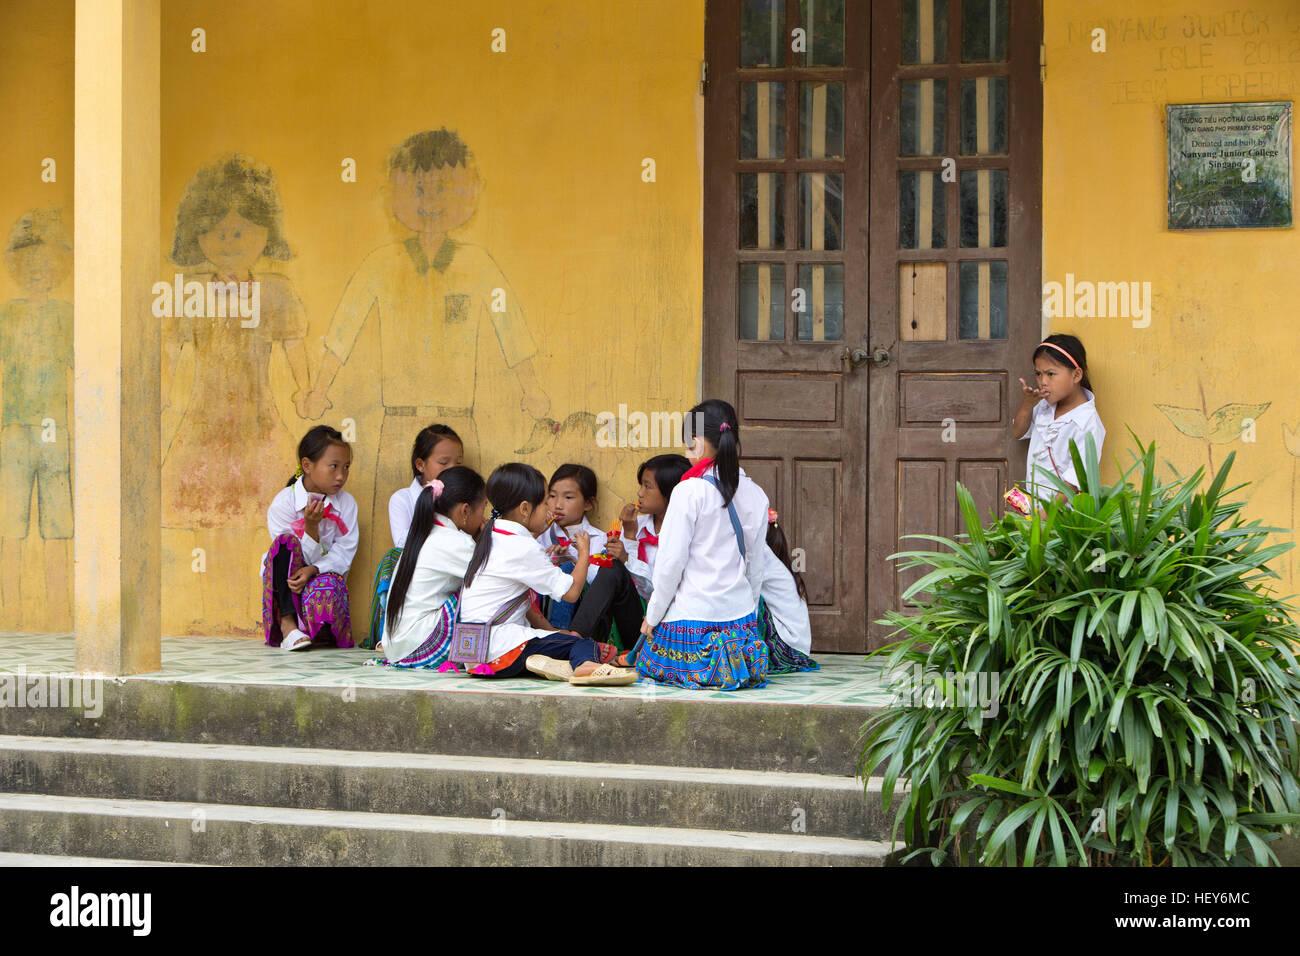 Young girls communicating & enjoying a snack during school break. - Stock Image